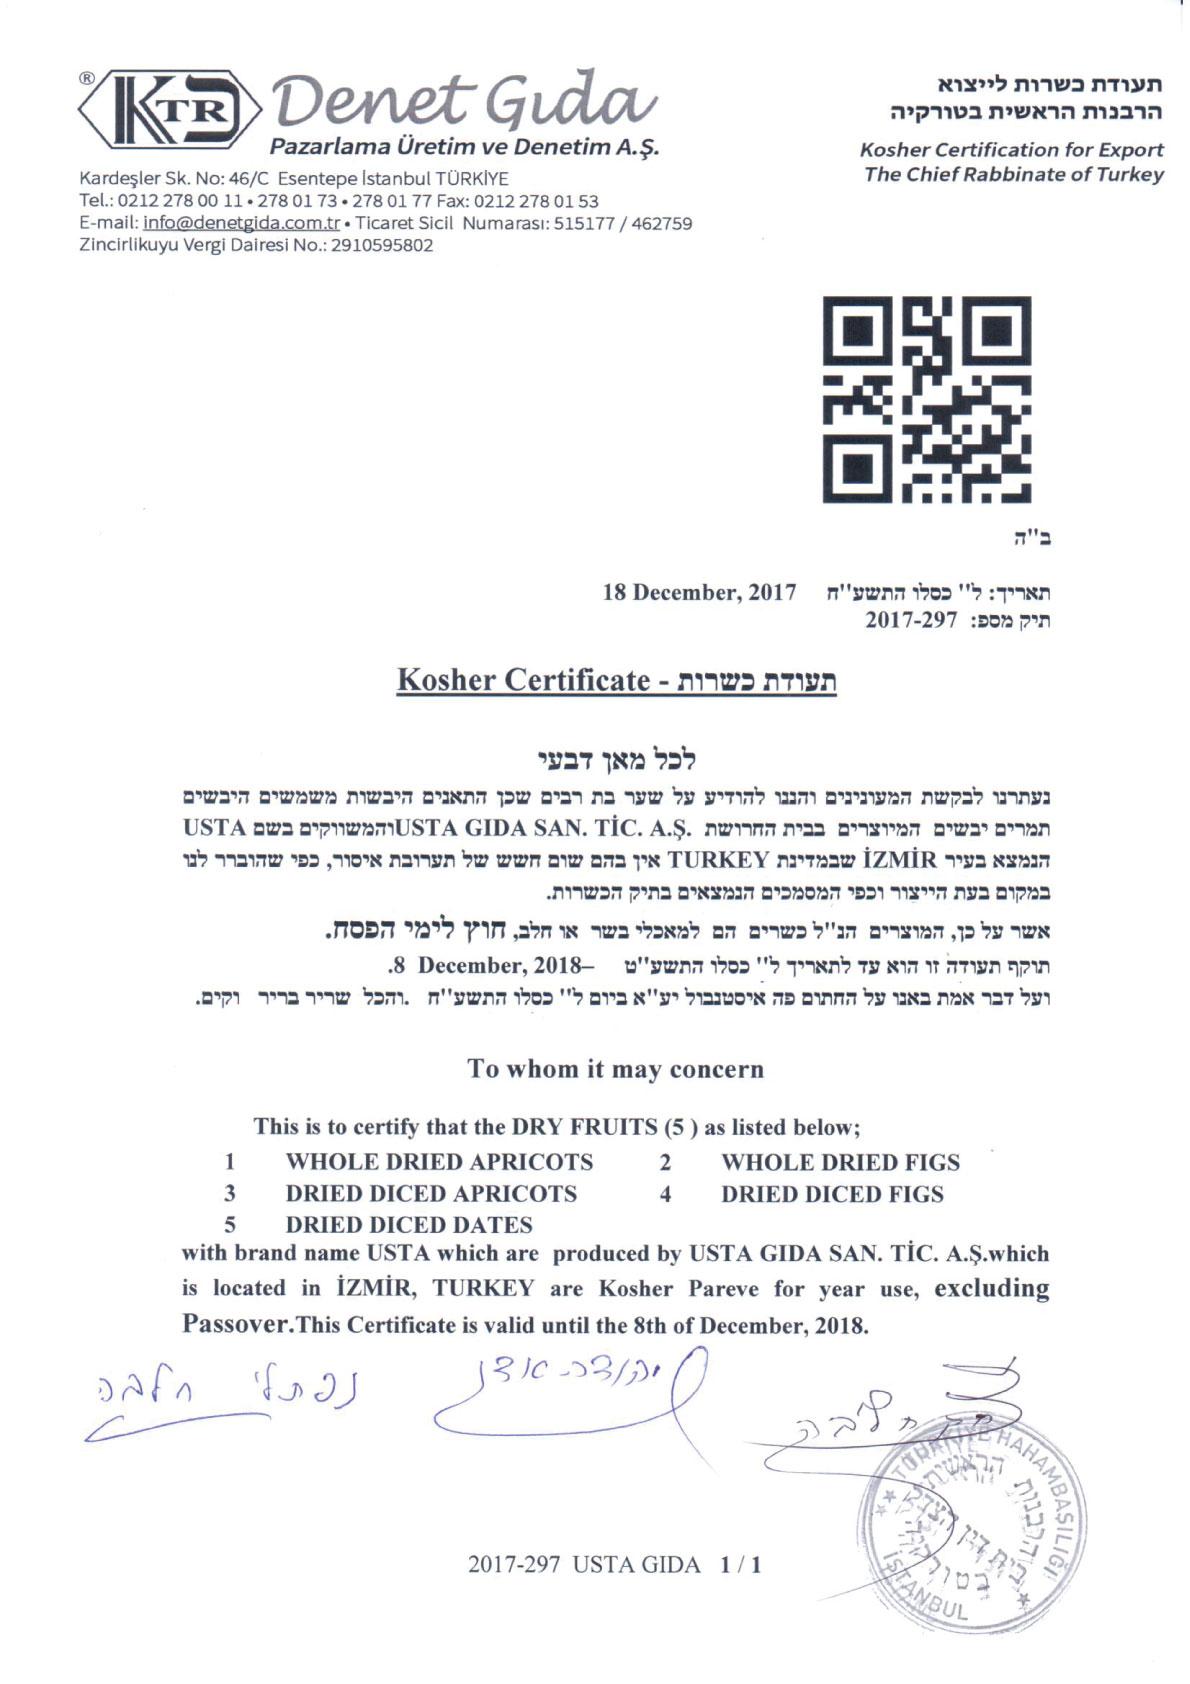 Kosher Certificate - Usta Food Industry Agricultural